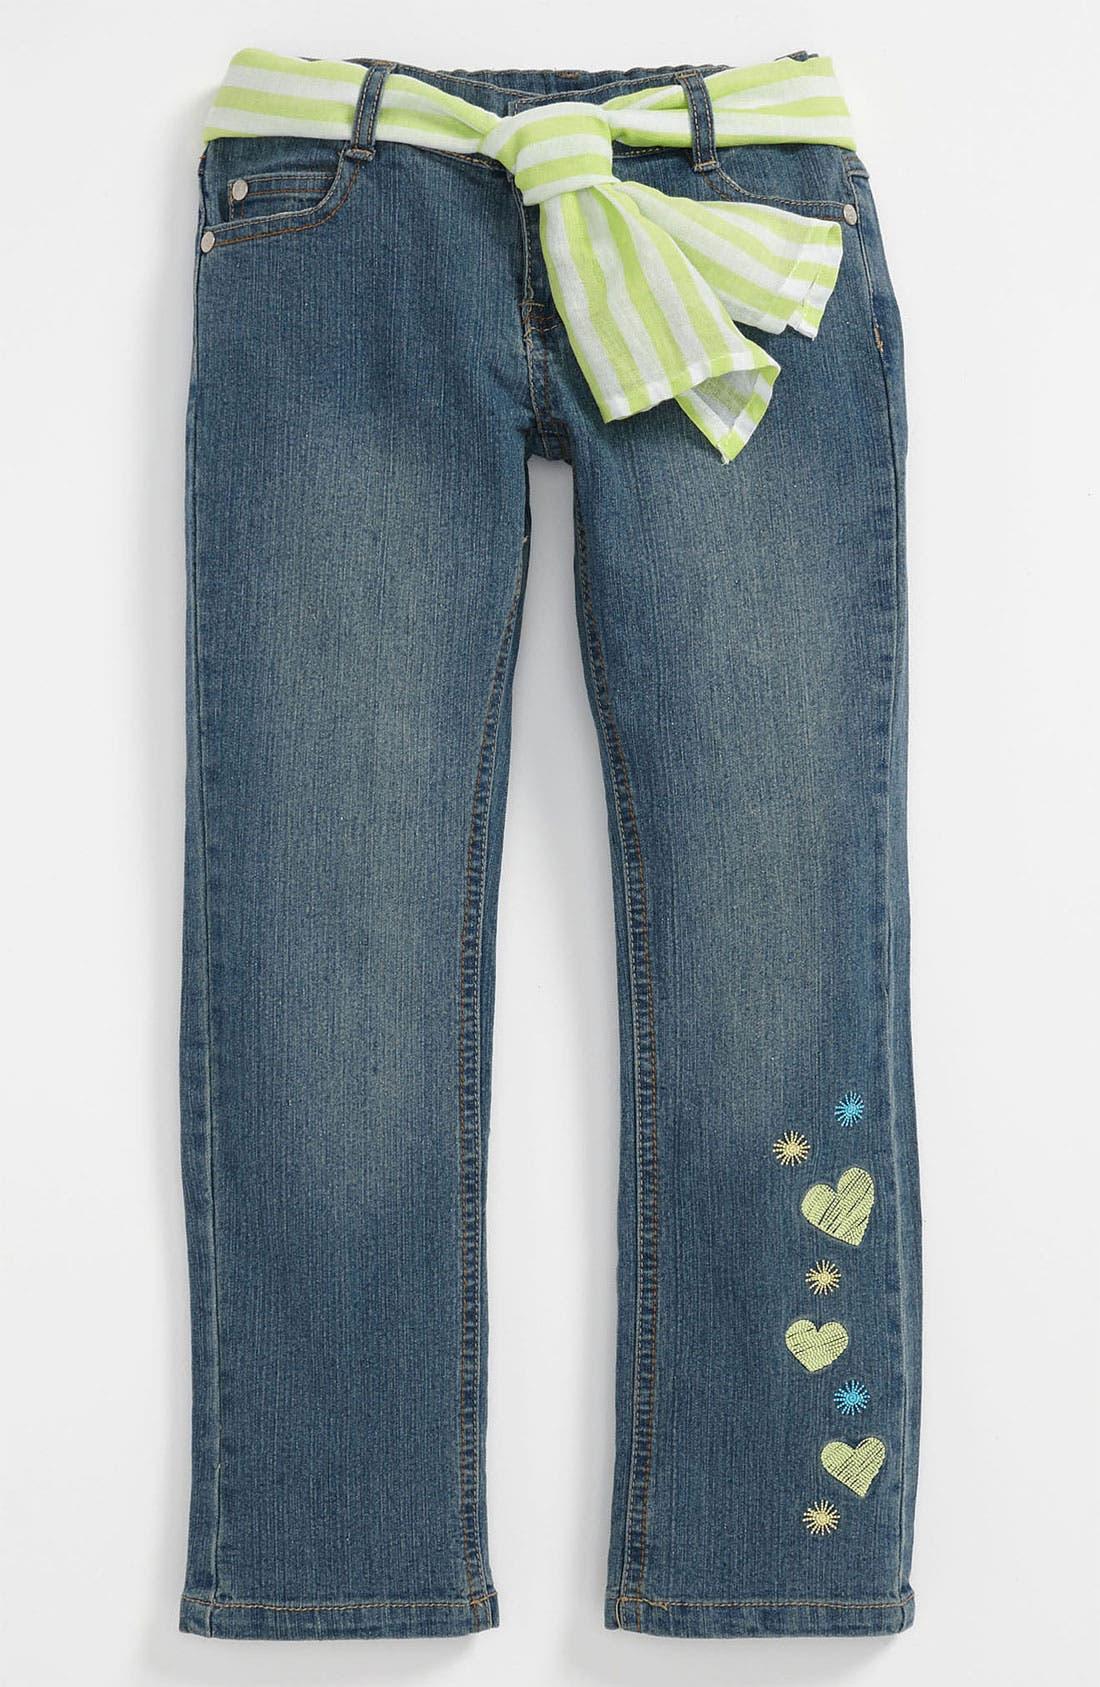 Main Image - Pumpkin Patch Embroidered Denim Jeans (Little Girls & Big Girls)